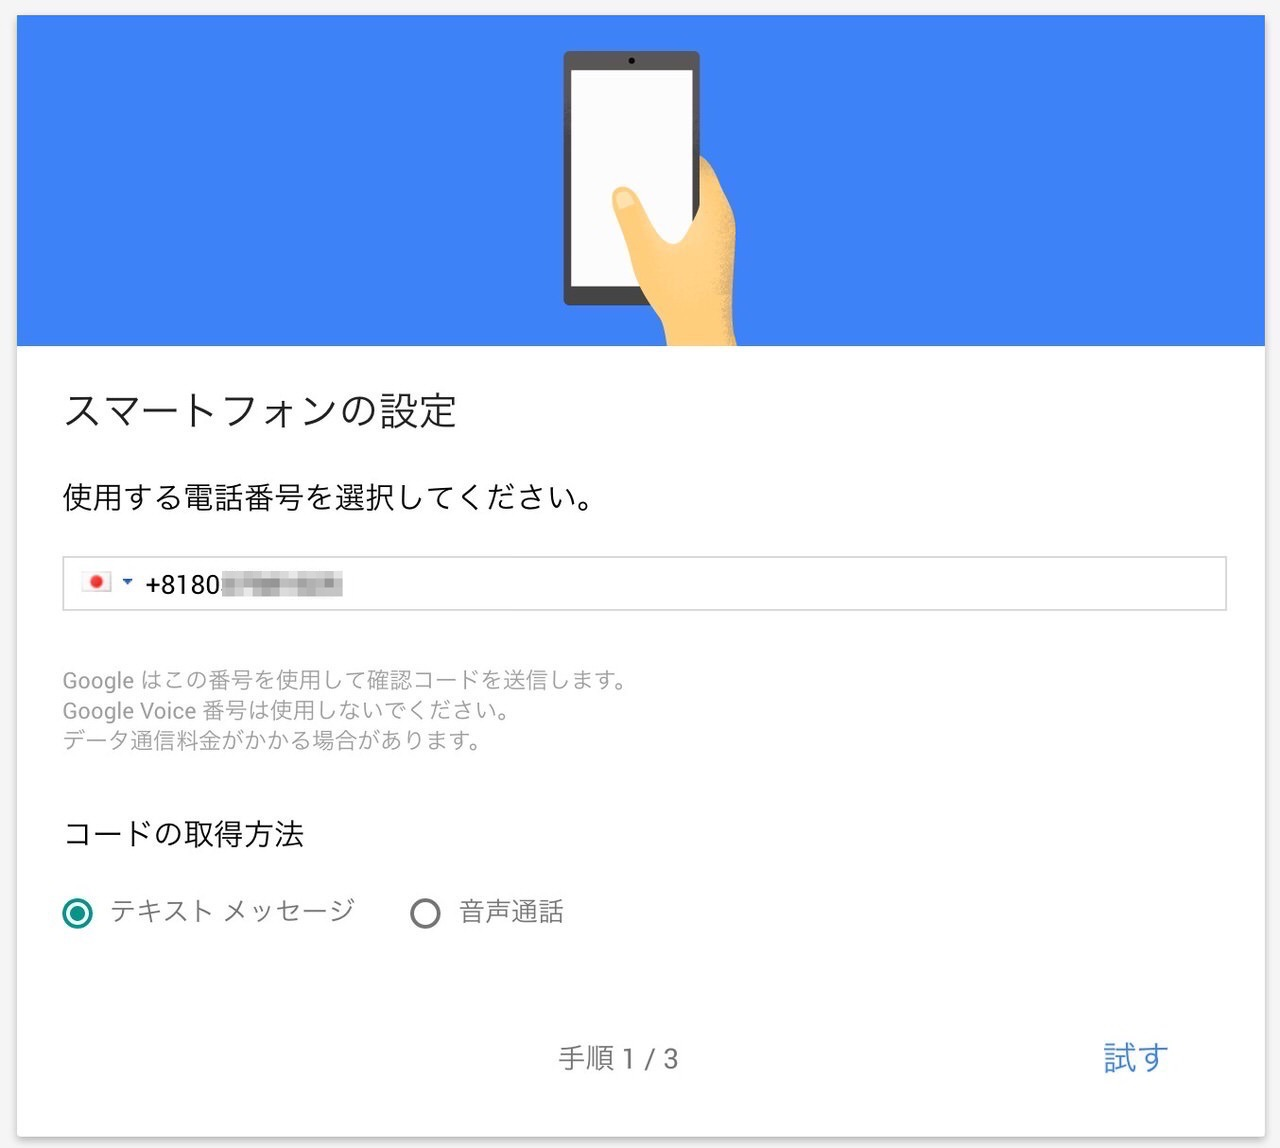 Google 06 23 1050